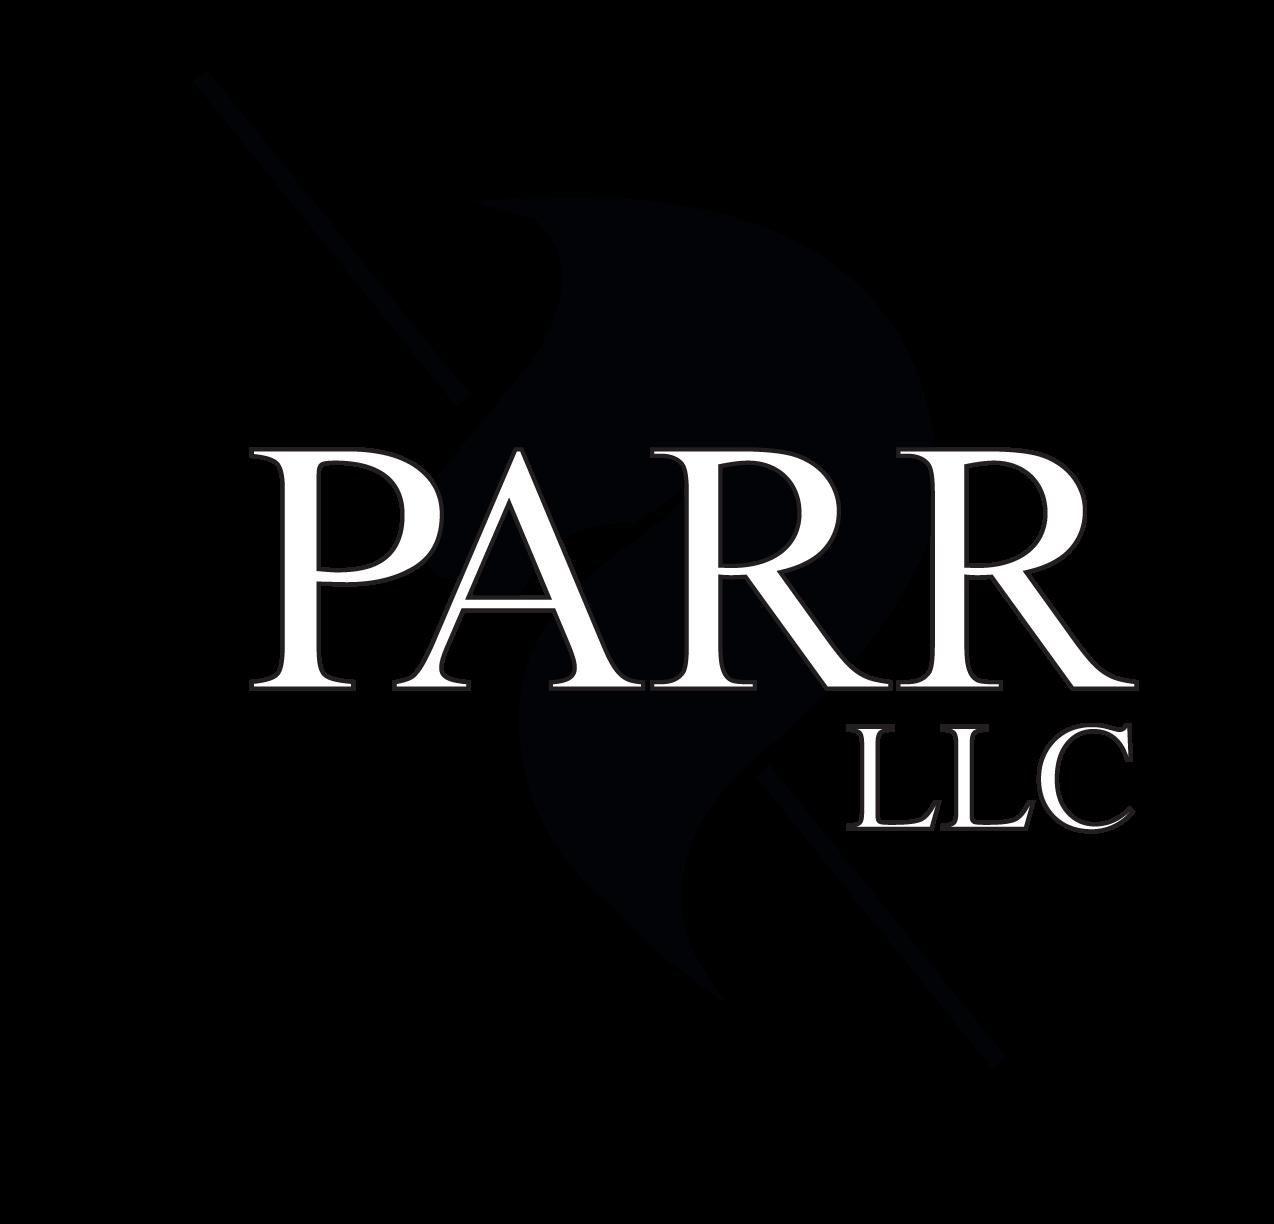 BW OL Parr LLC Logo-02.png